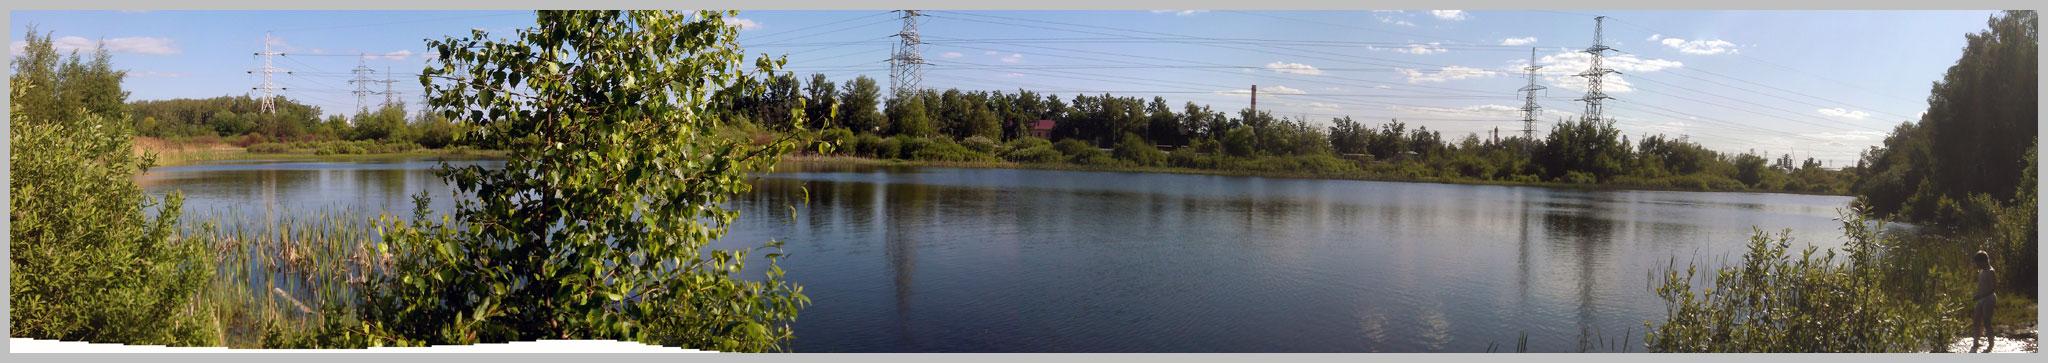 http://stdrf.com/4kat/lake-2pan.jpg